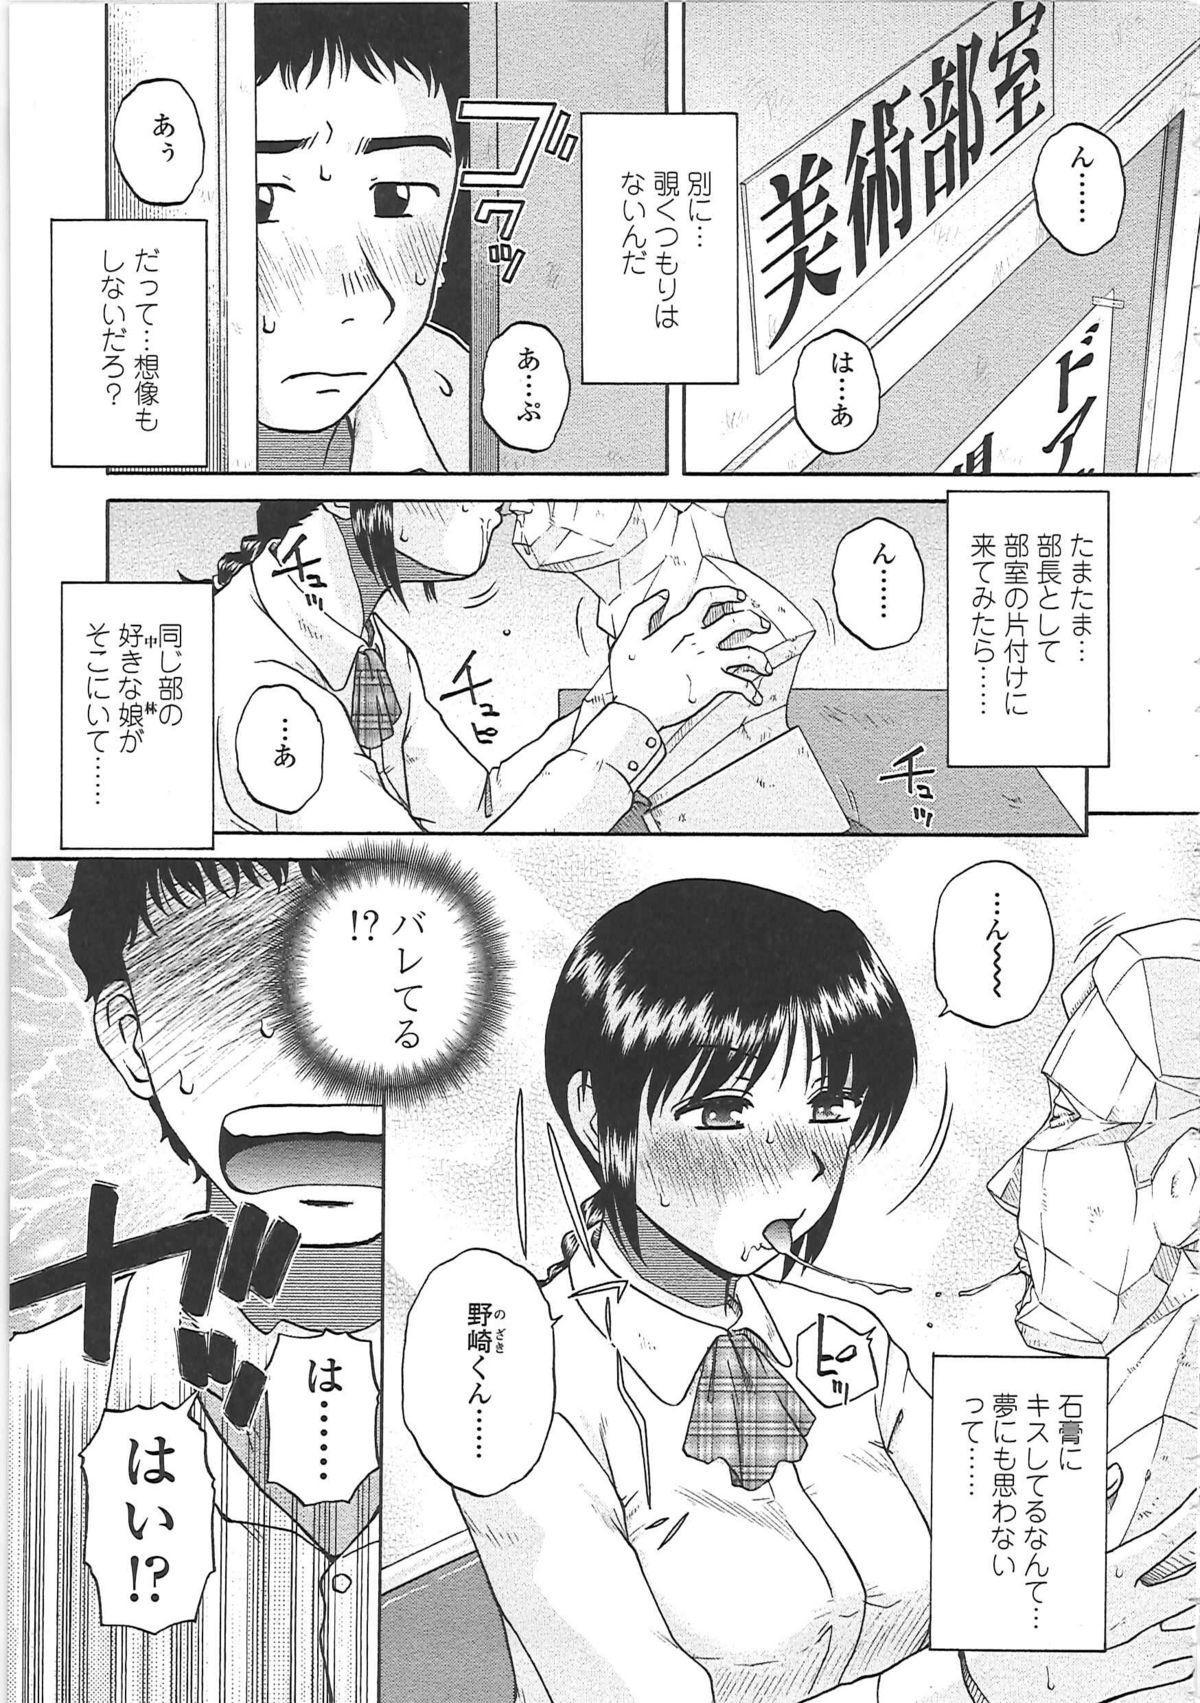 Nikuzuma Tsuushin - Erotic Wife Communication 63